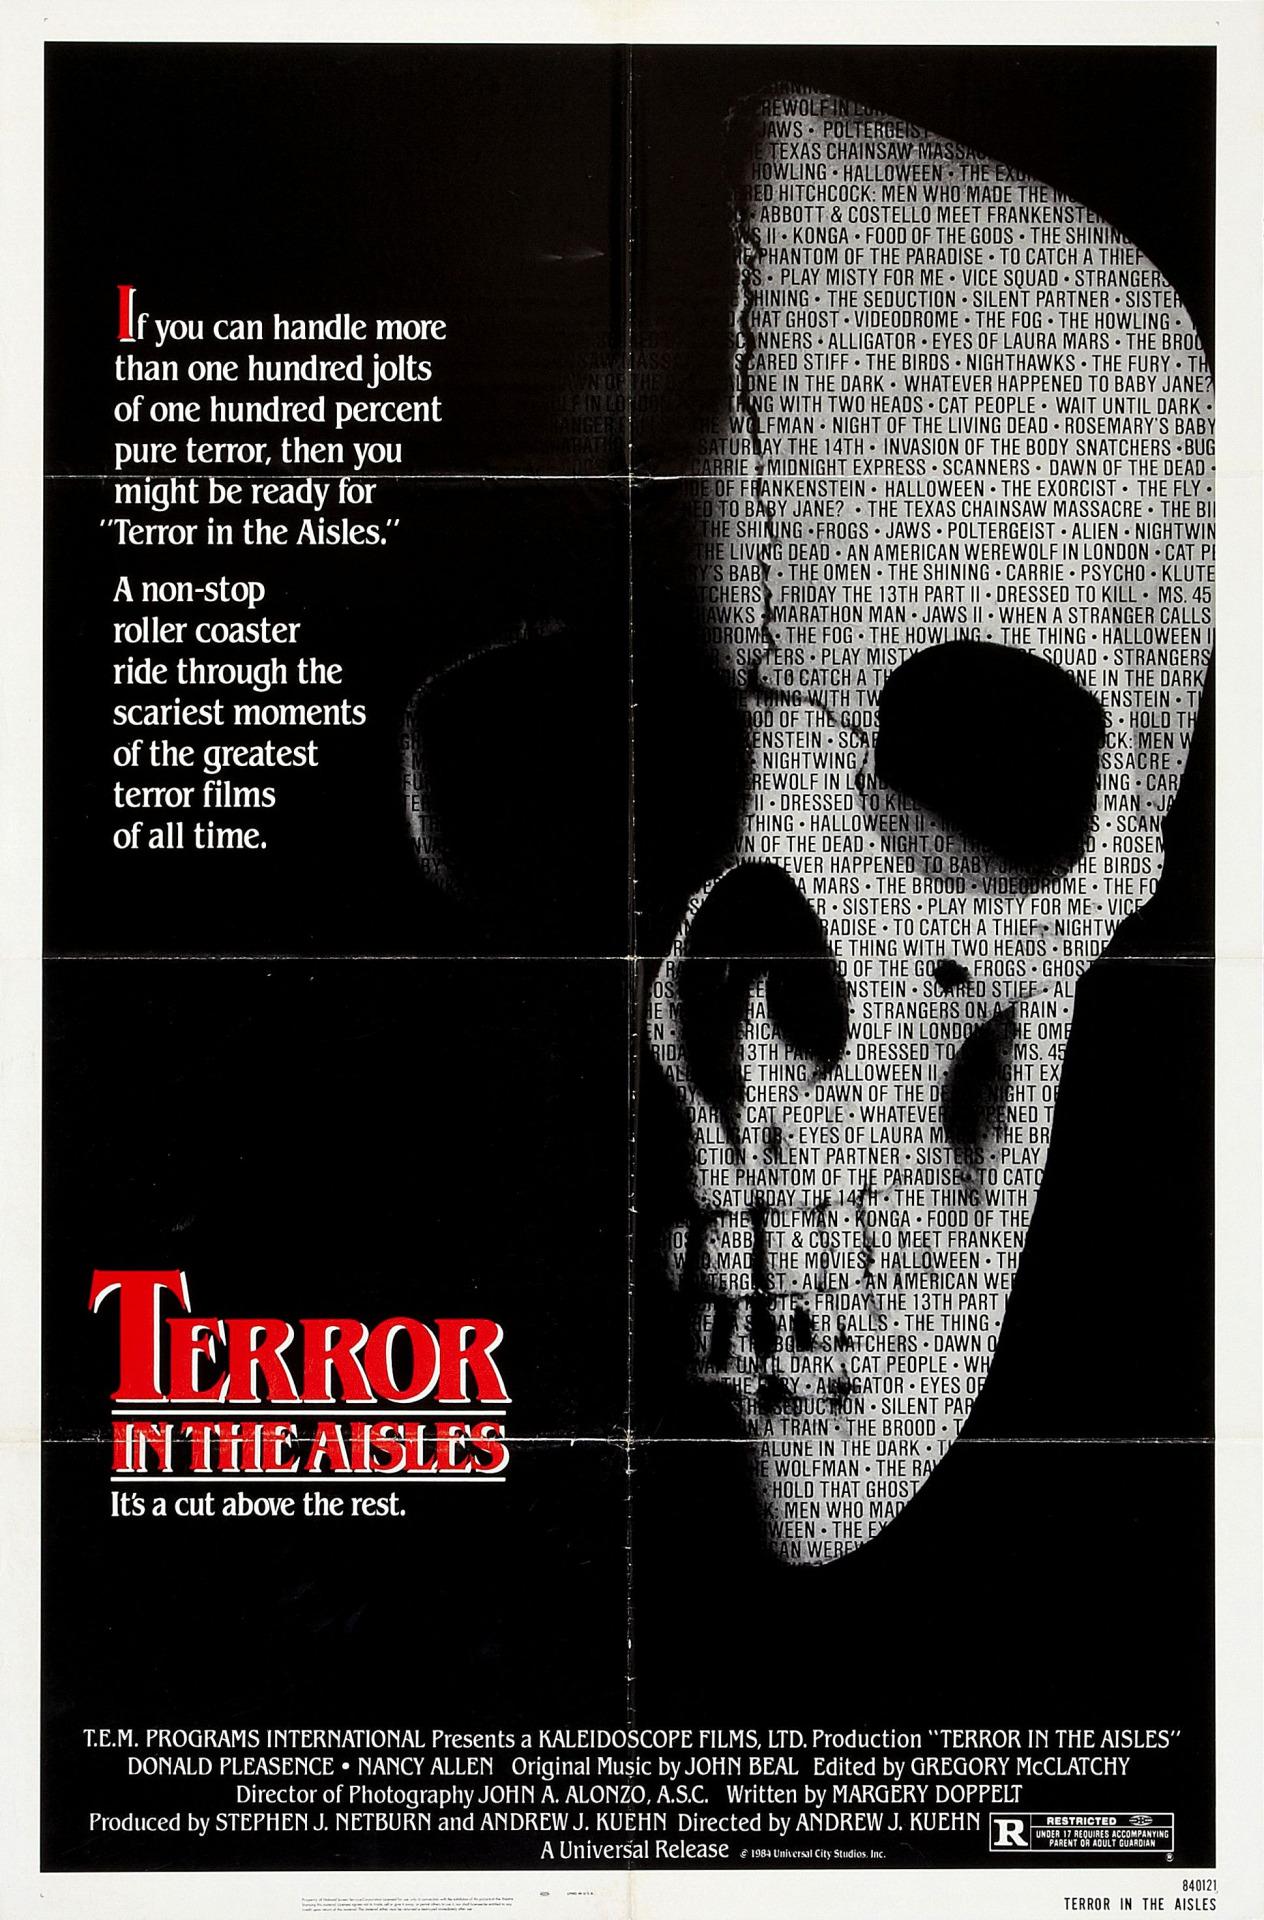 09_film horror_1985